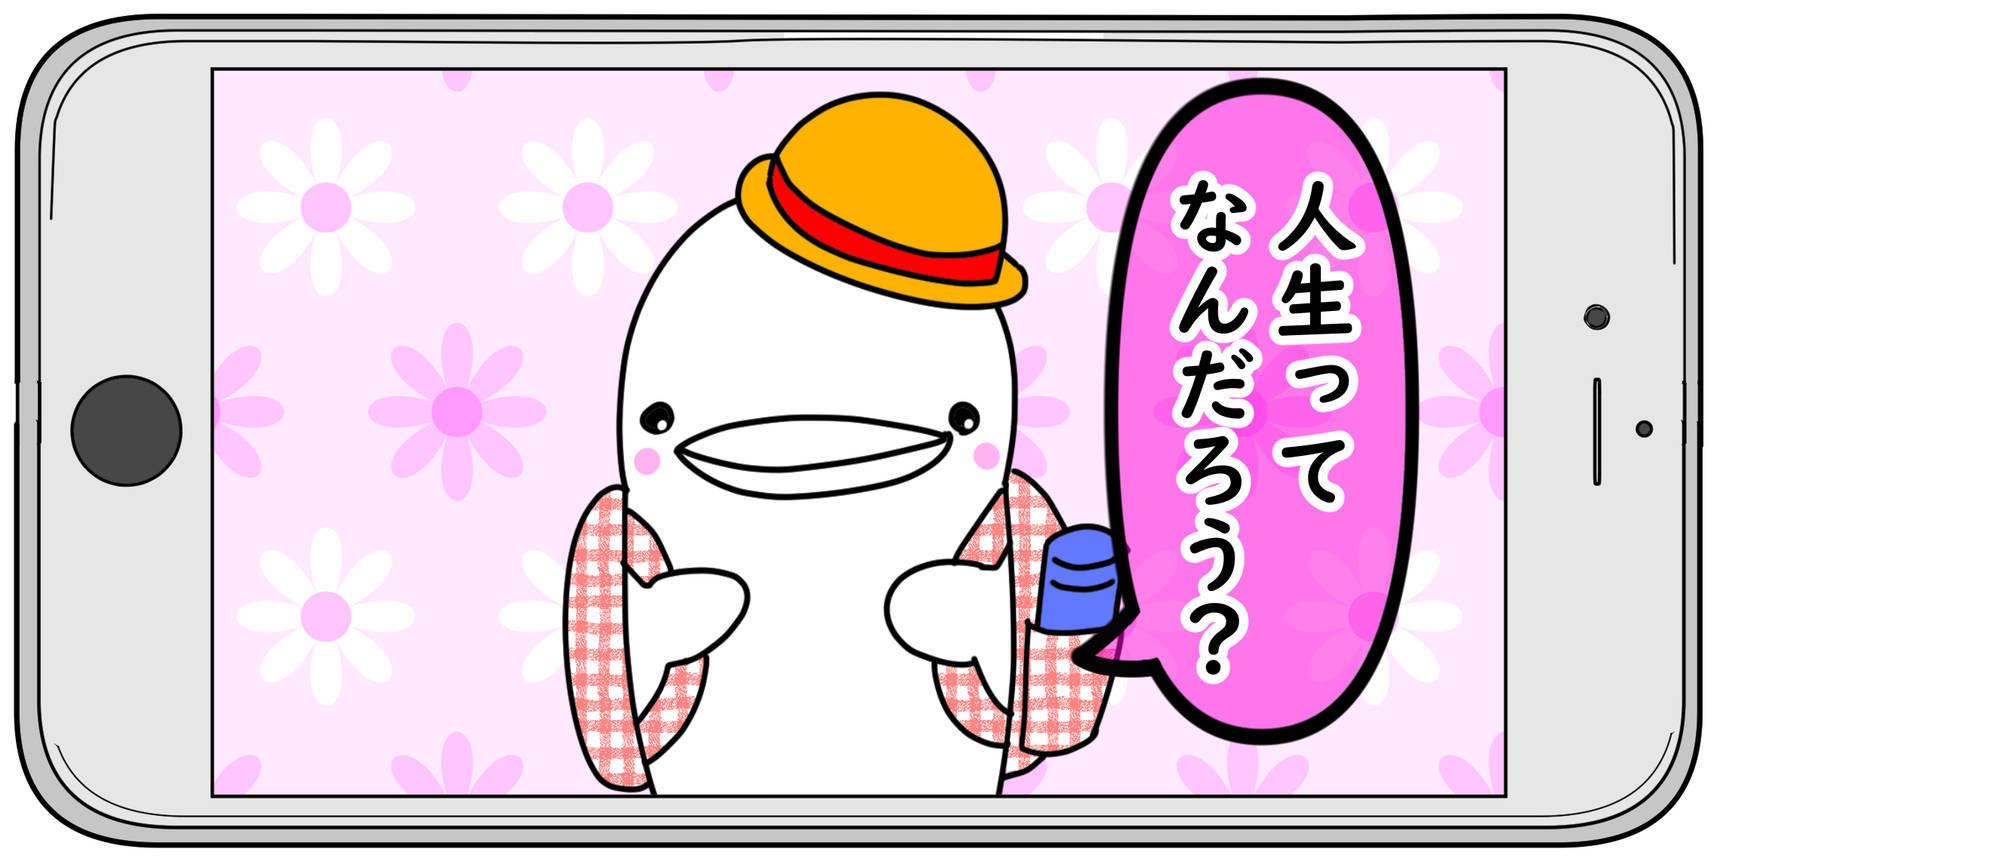 f:id:shiro_iruka:20190509031104j:plain